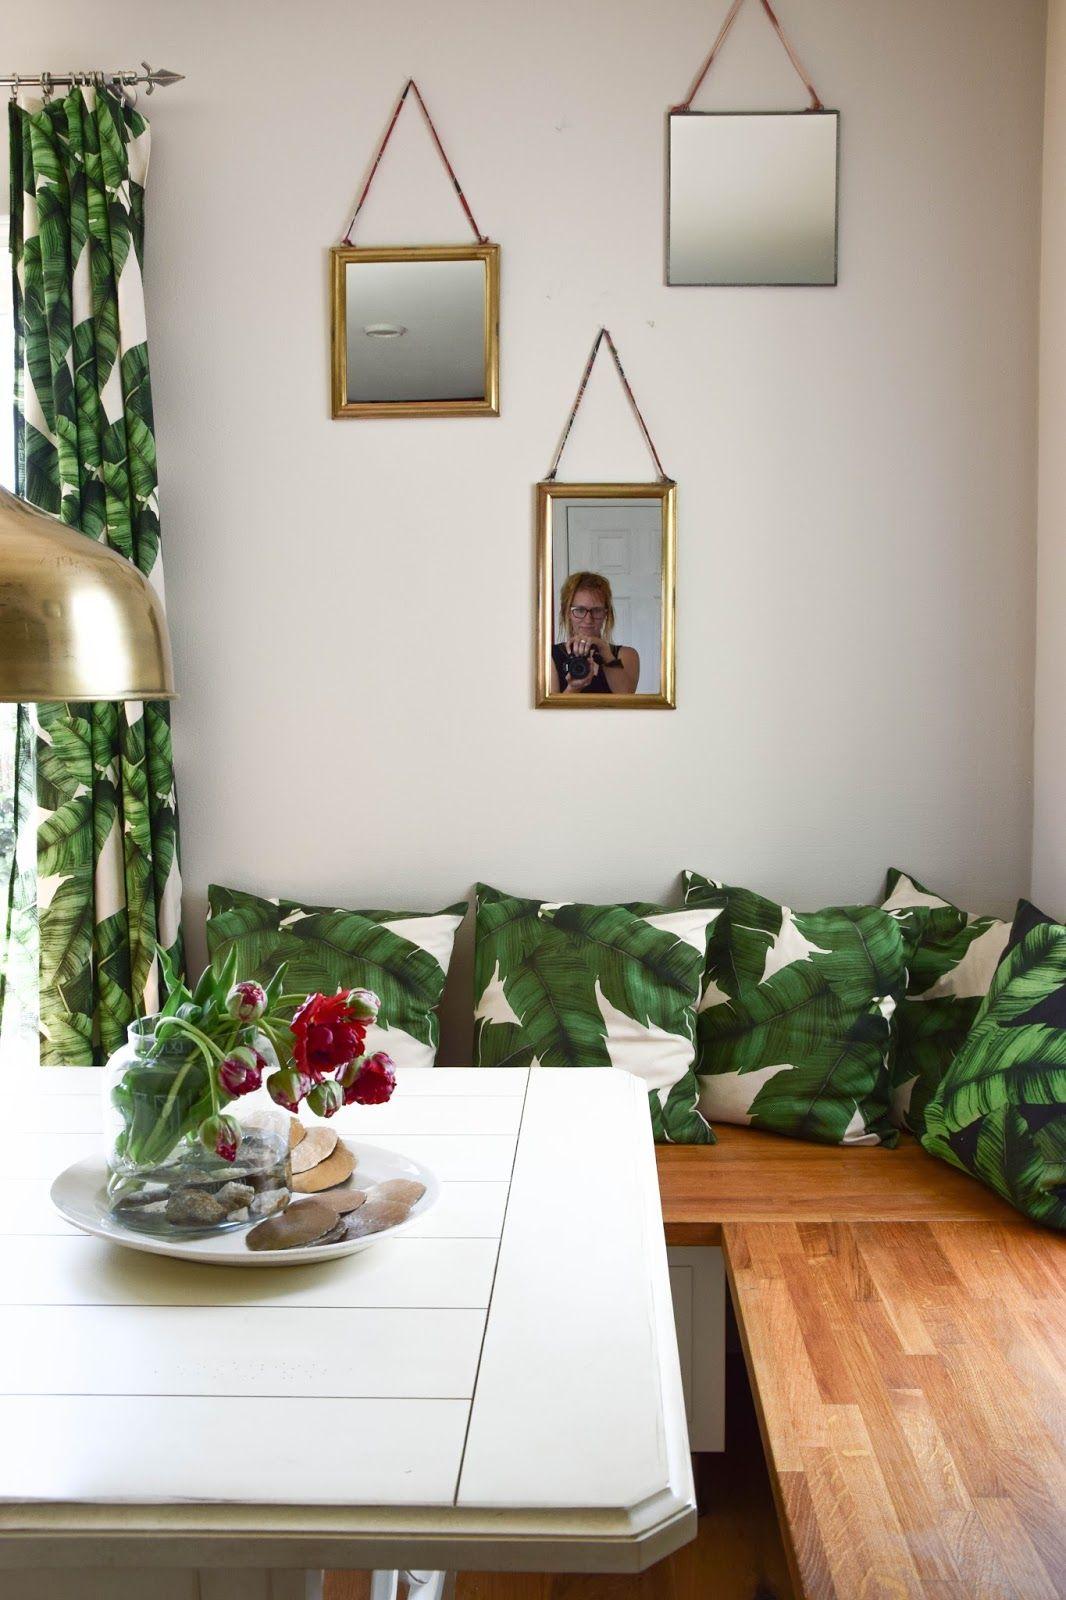 Blumen Und Wanddeko Furs Esszimmer Wand Deko Ideen Fur Schone Wande